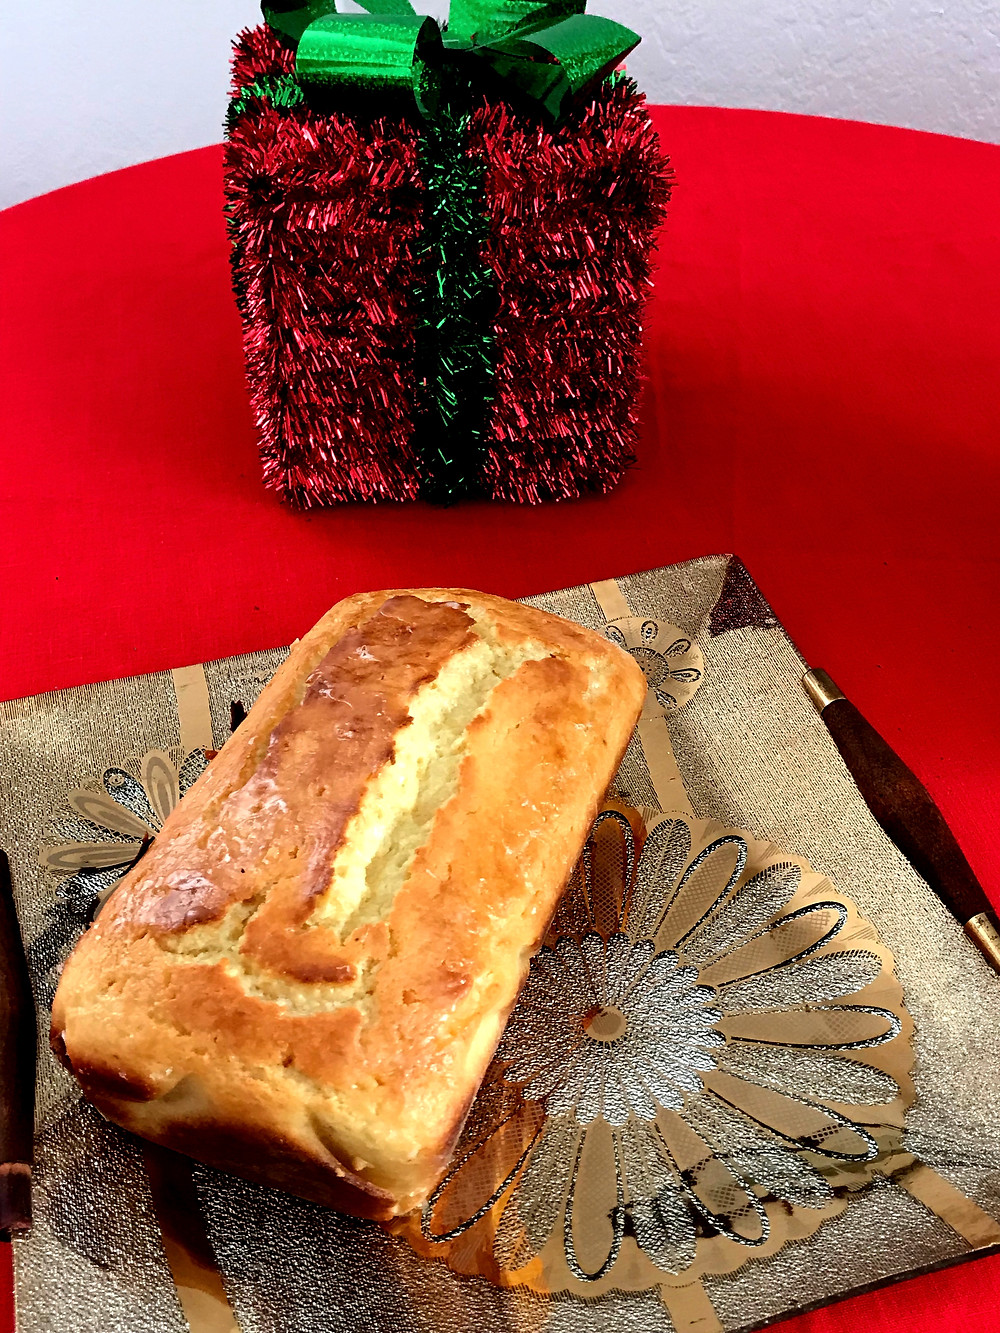 Lemon and Sour Cream Loaf